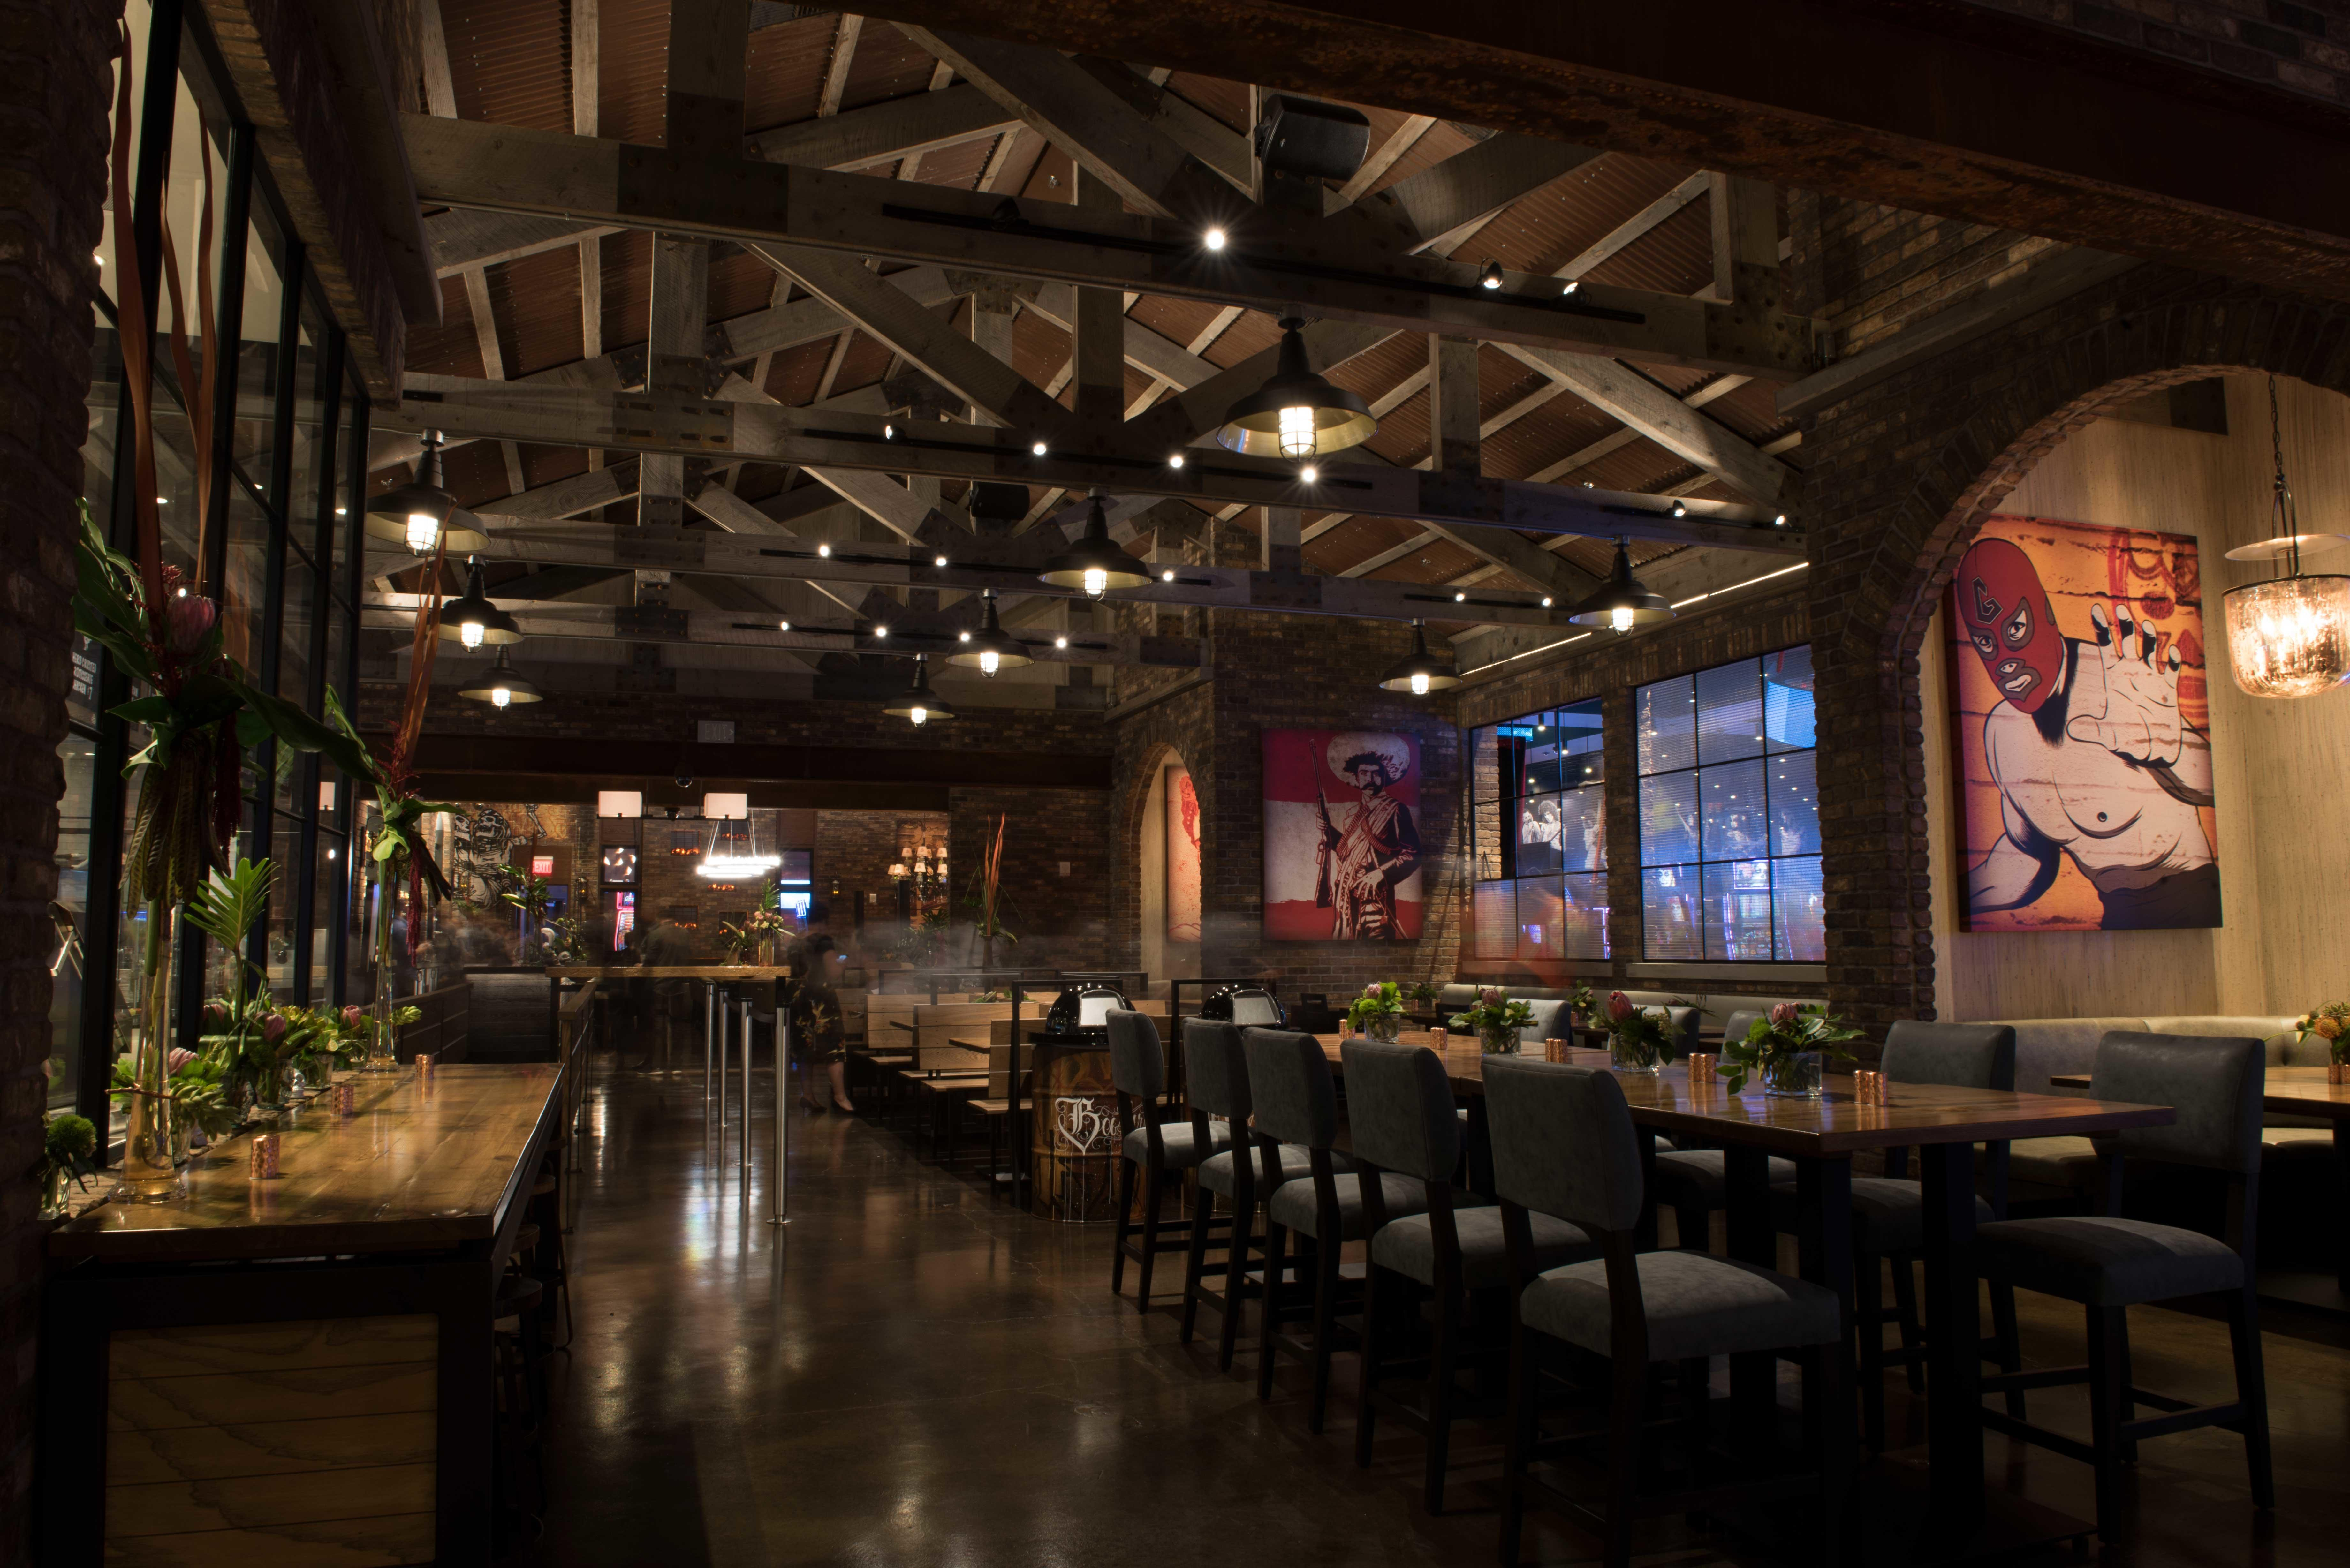 George Lopez's Chingon Kitchen at San Manuel Casino